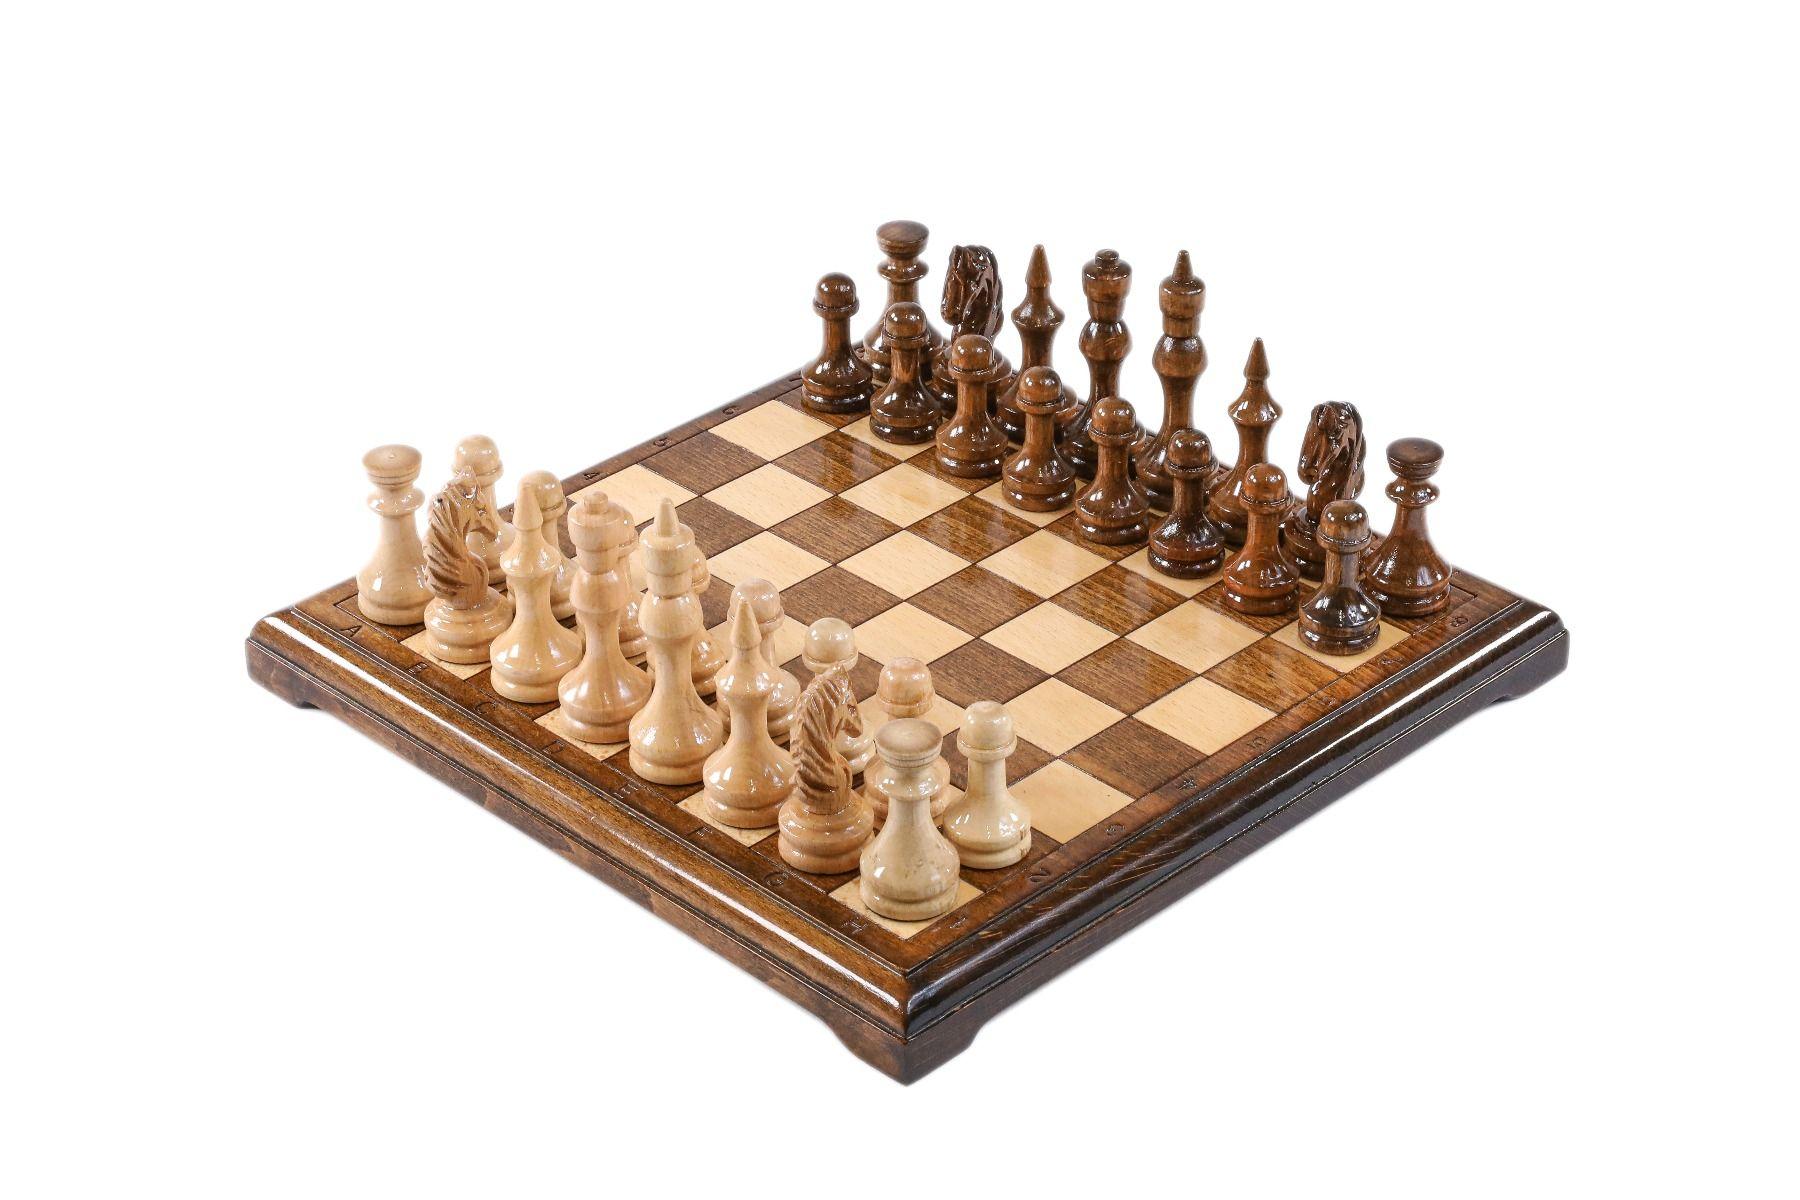 Square Chess Set